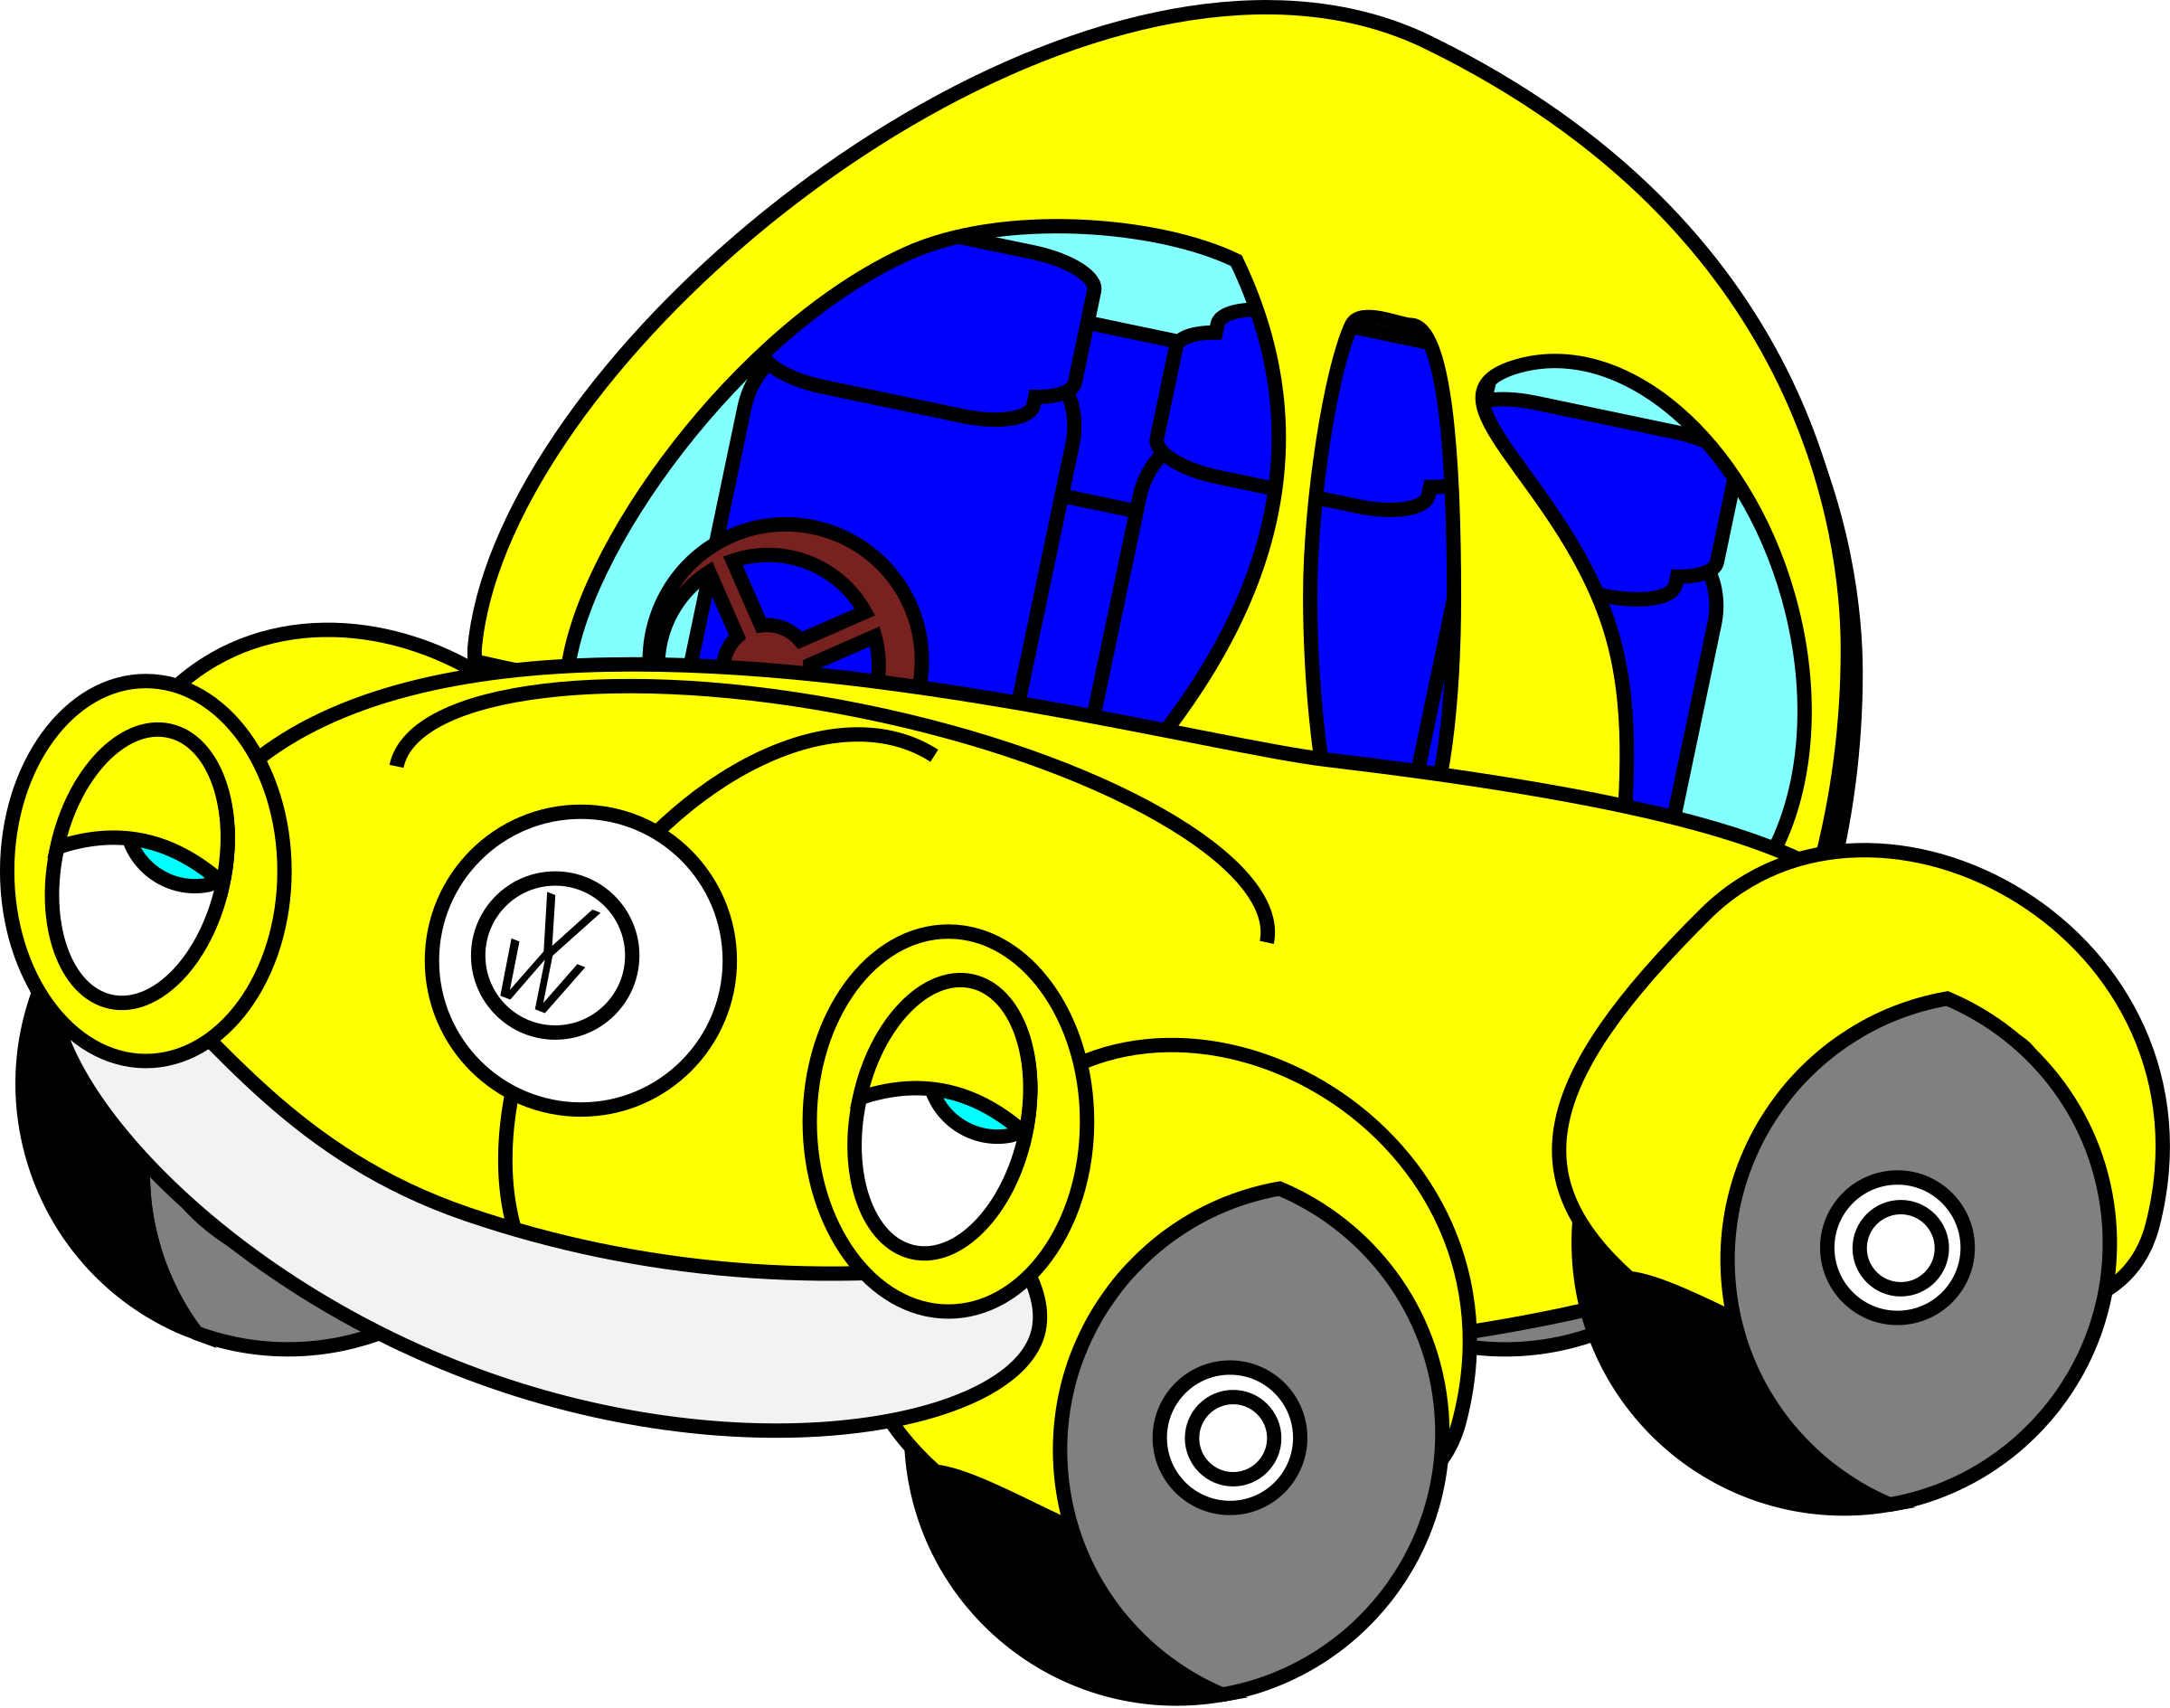 Sleepy vw big image. Clipart cars beetle